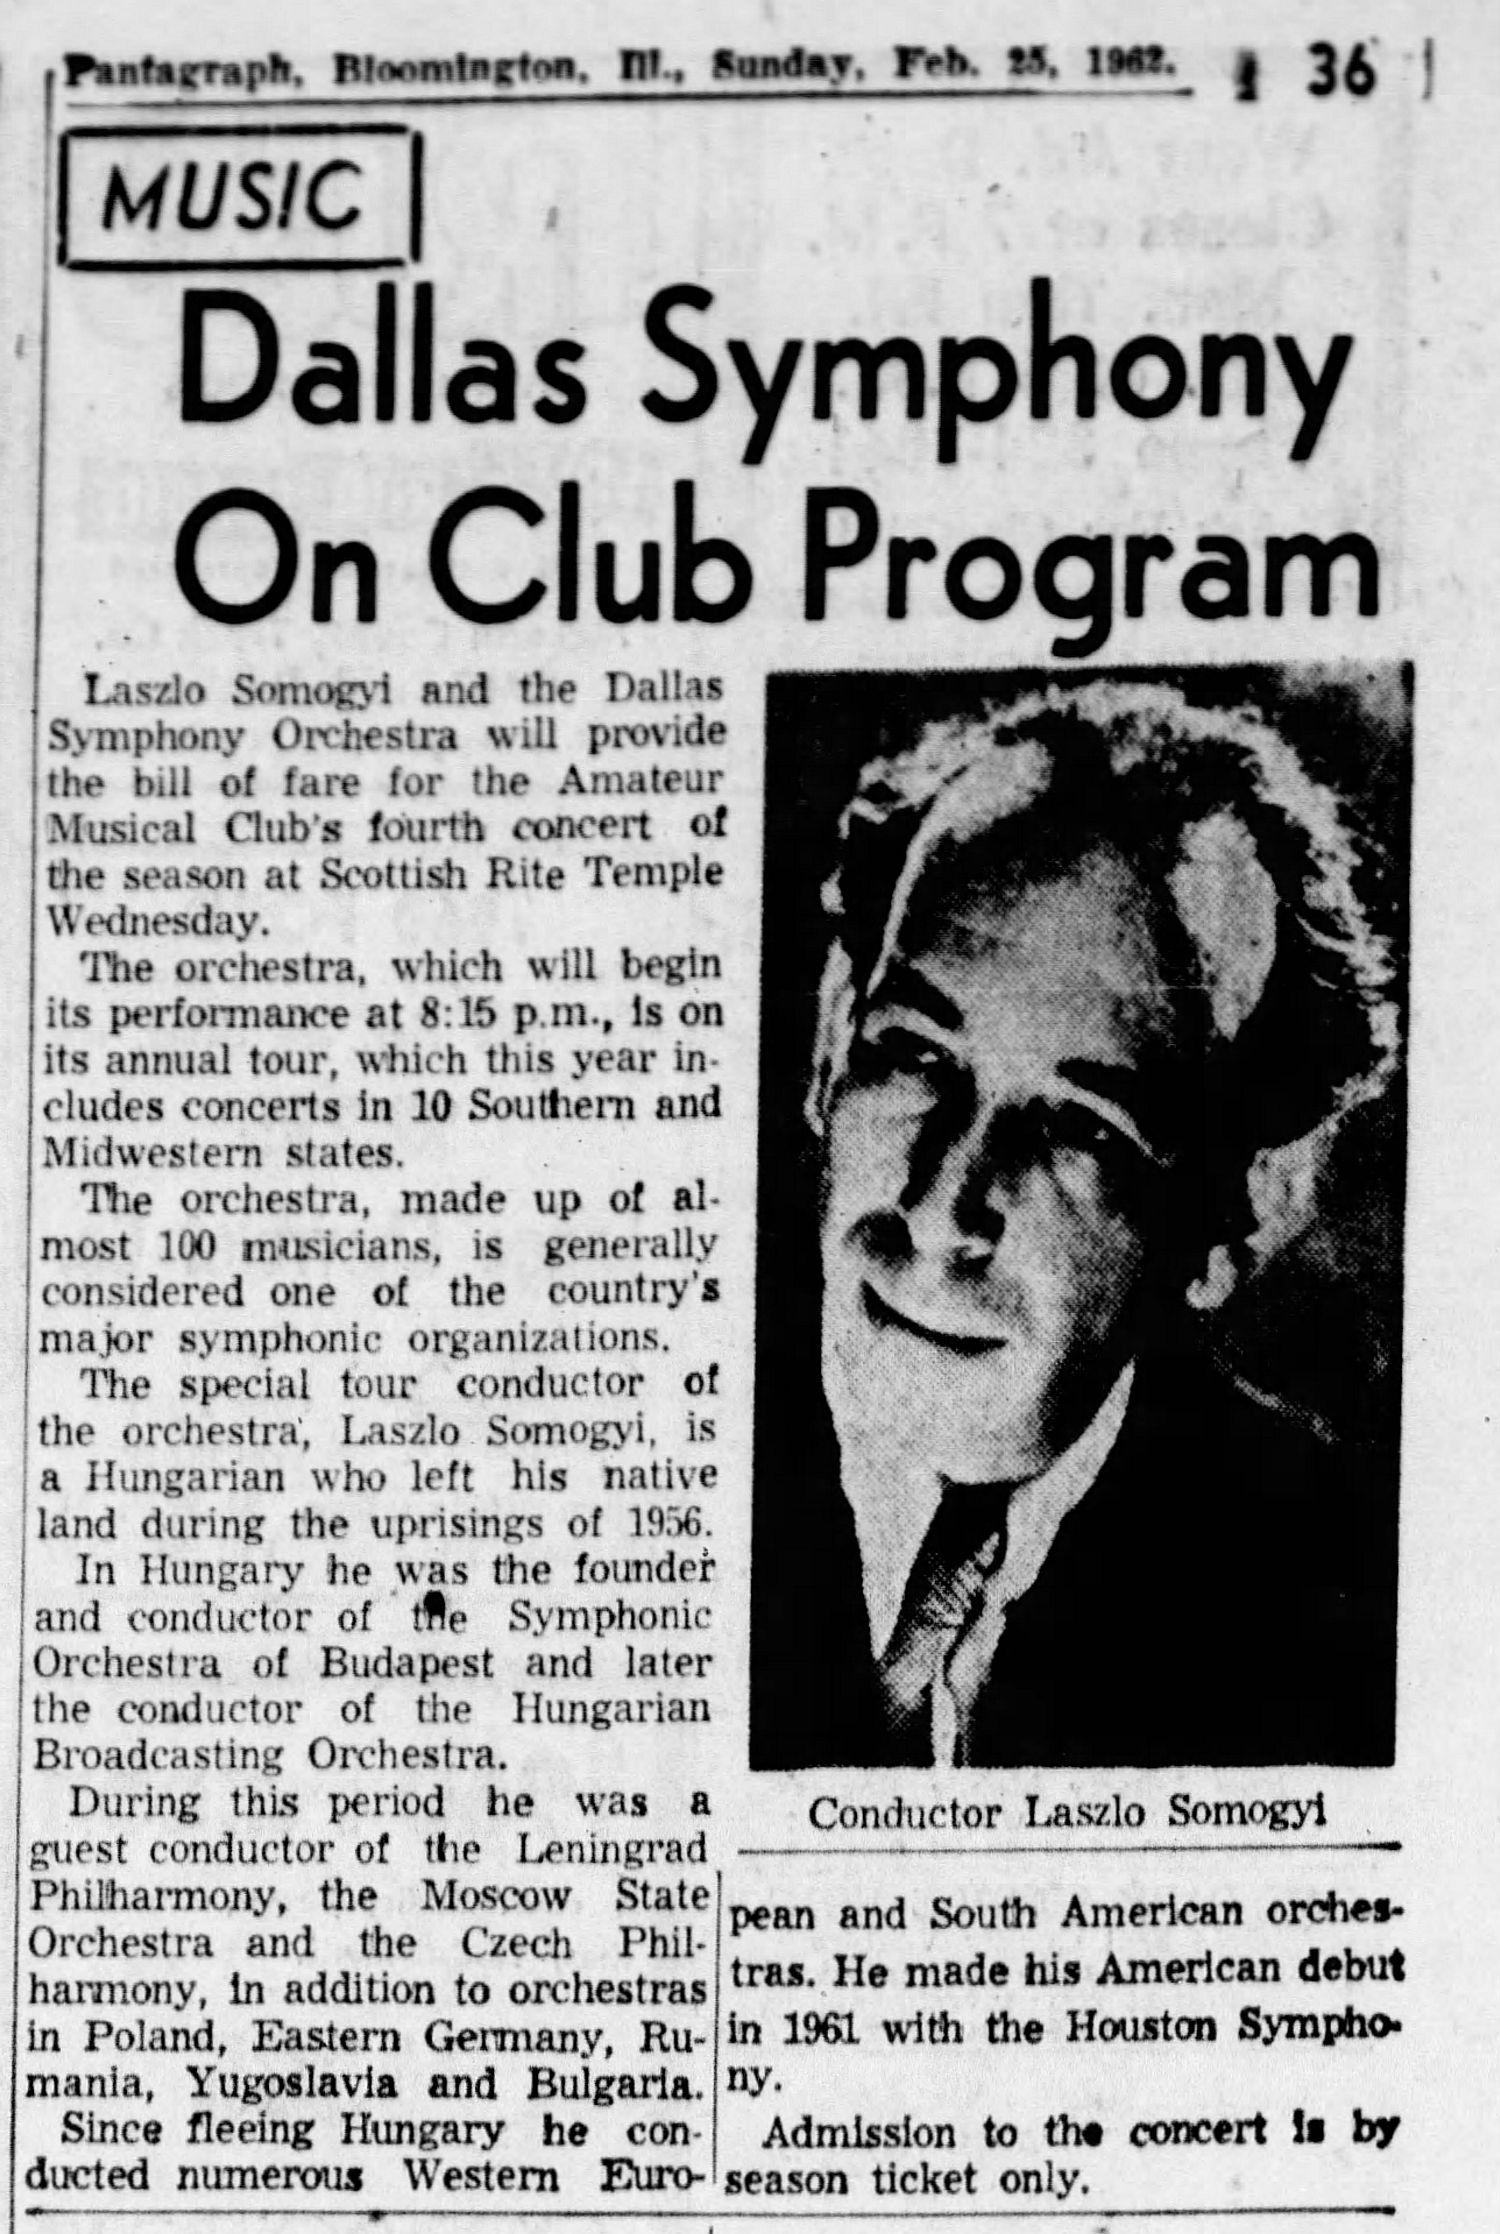 The Pantagraph Sun Feb 25 1962